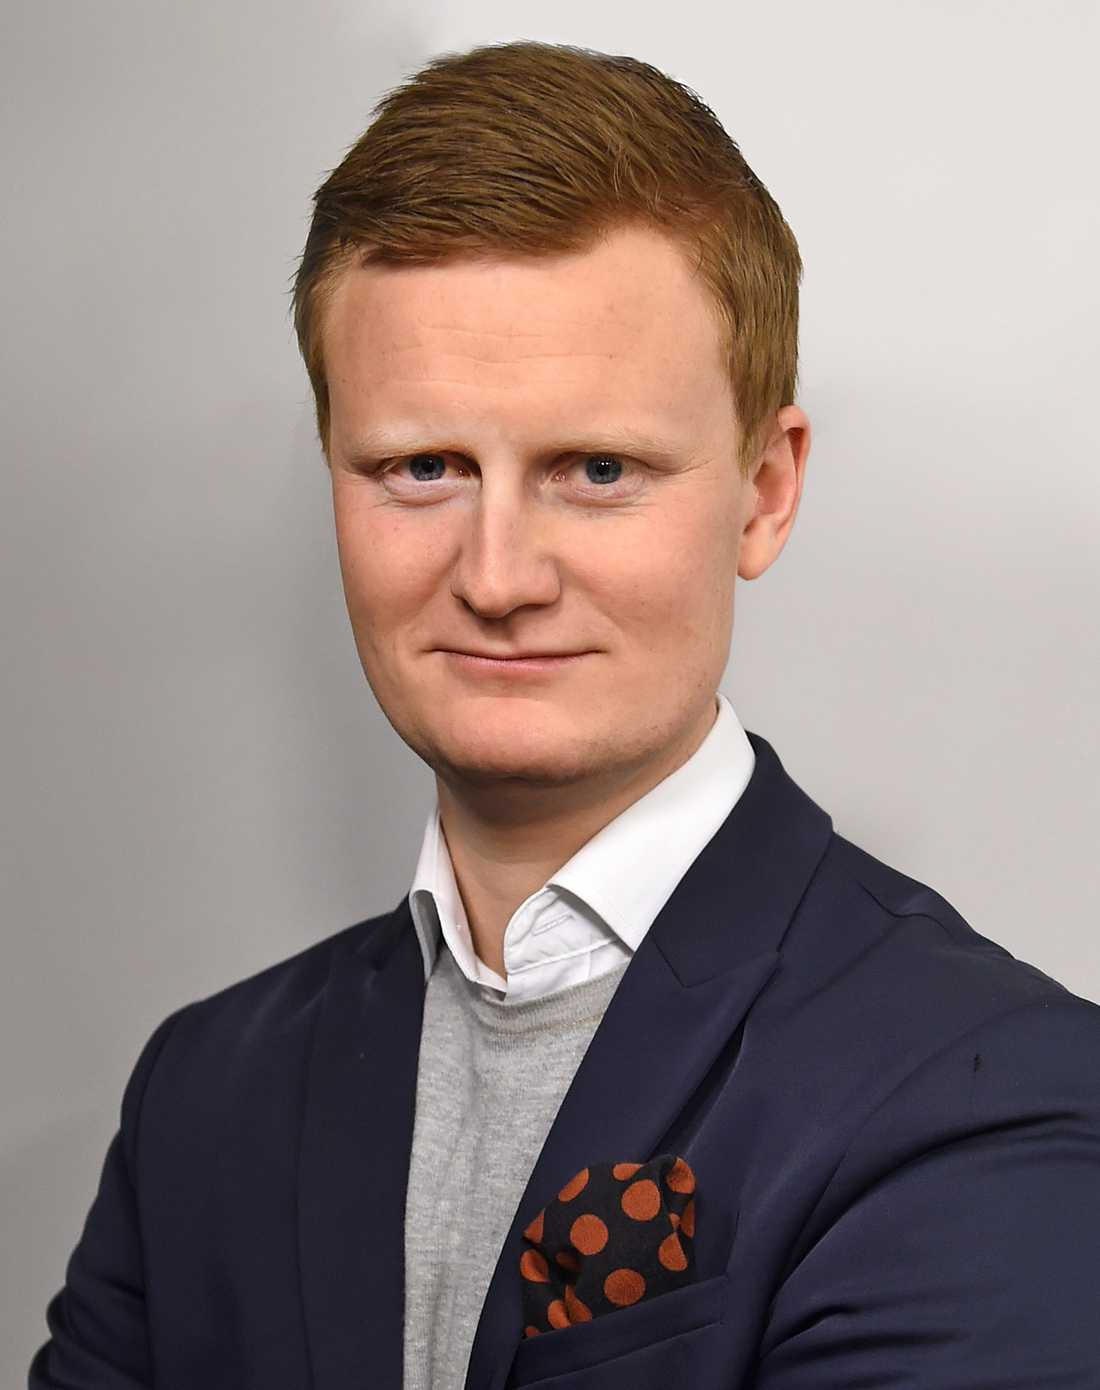 Patrik Fernlund